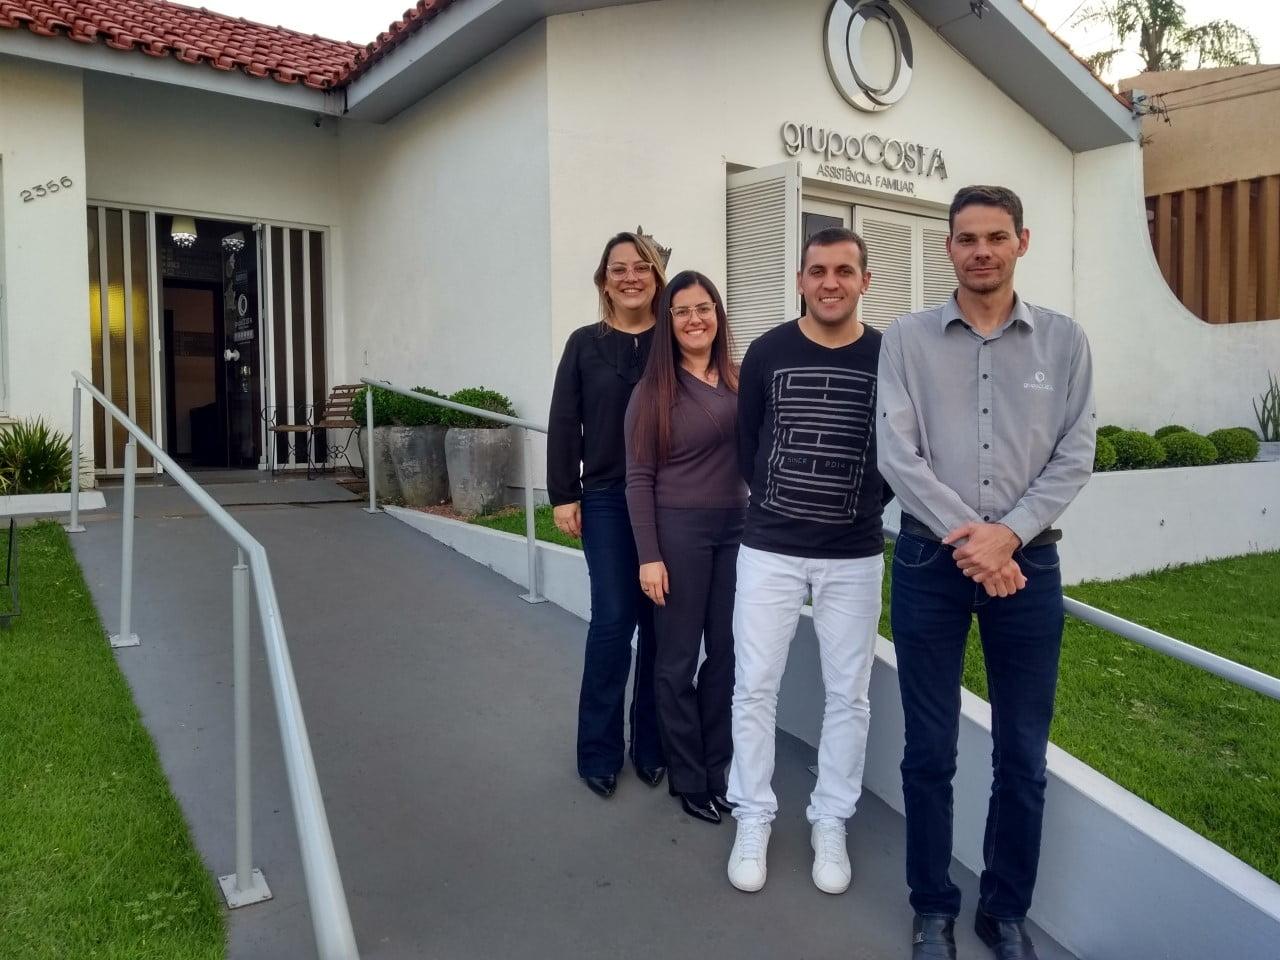 Grupo Costa de Taquari/RS adota o sistema da System